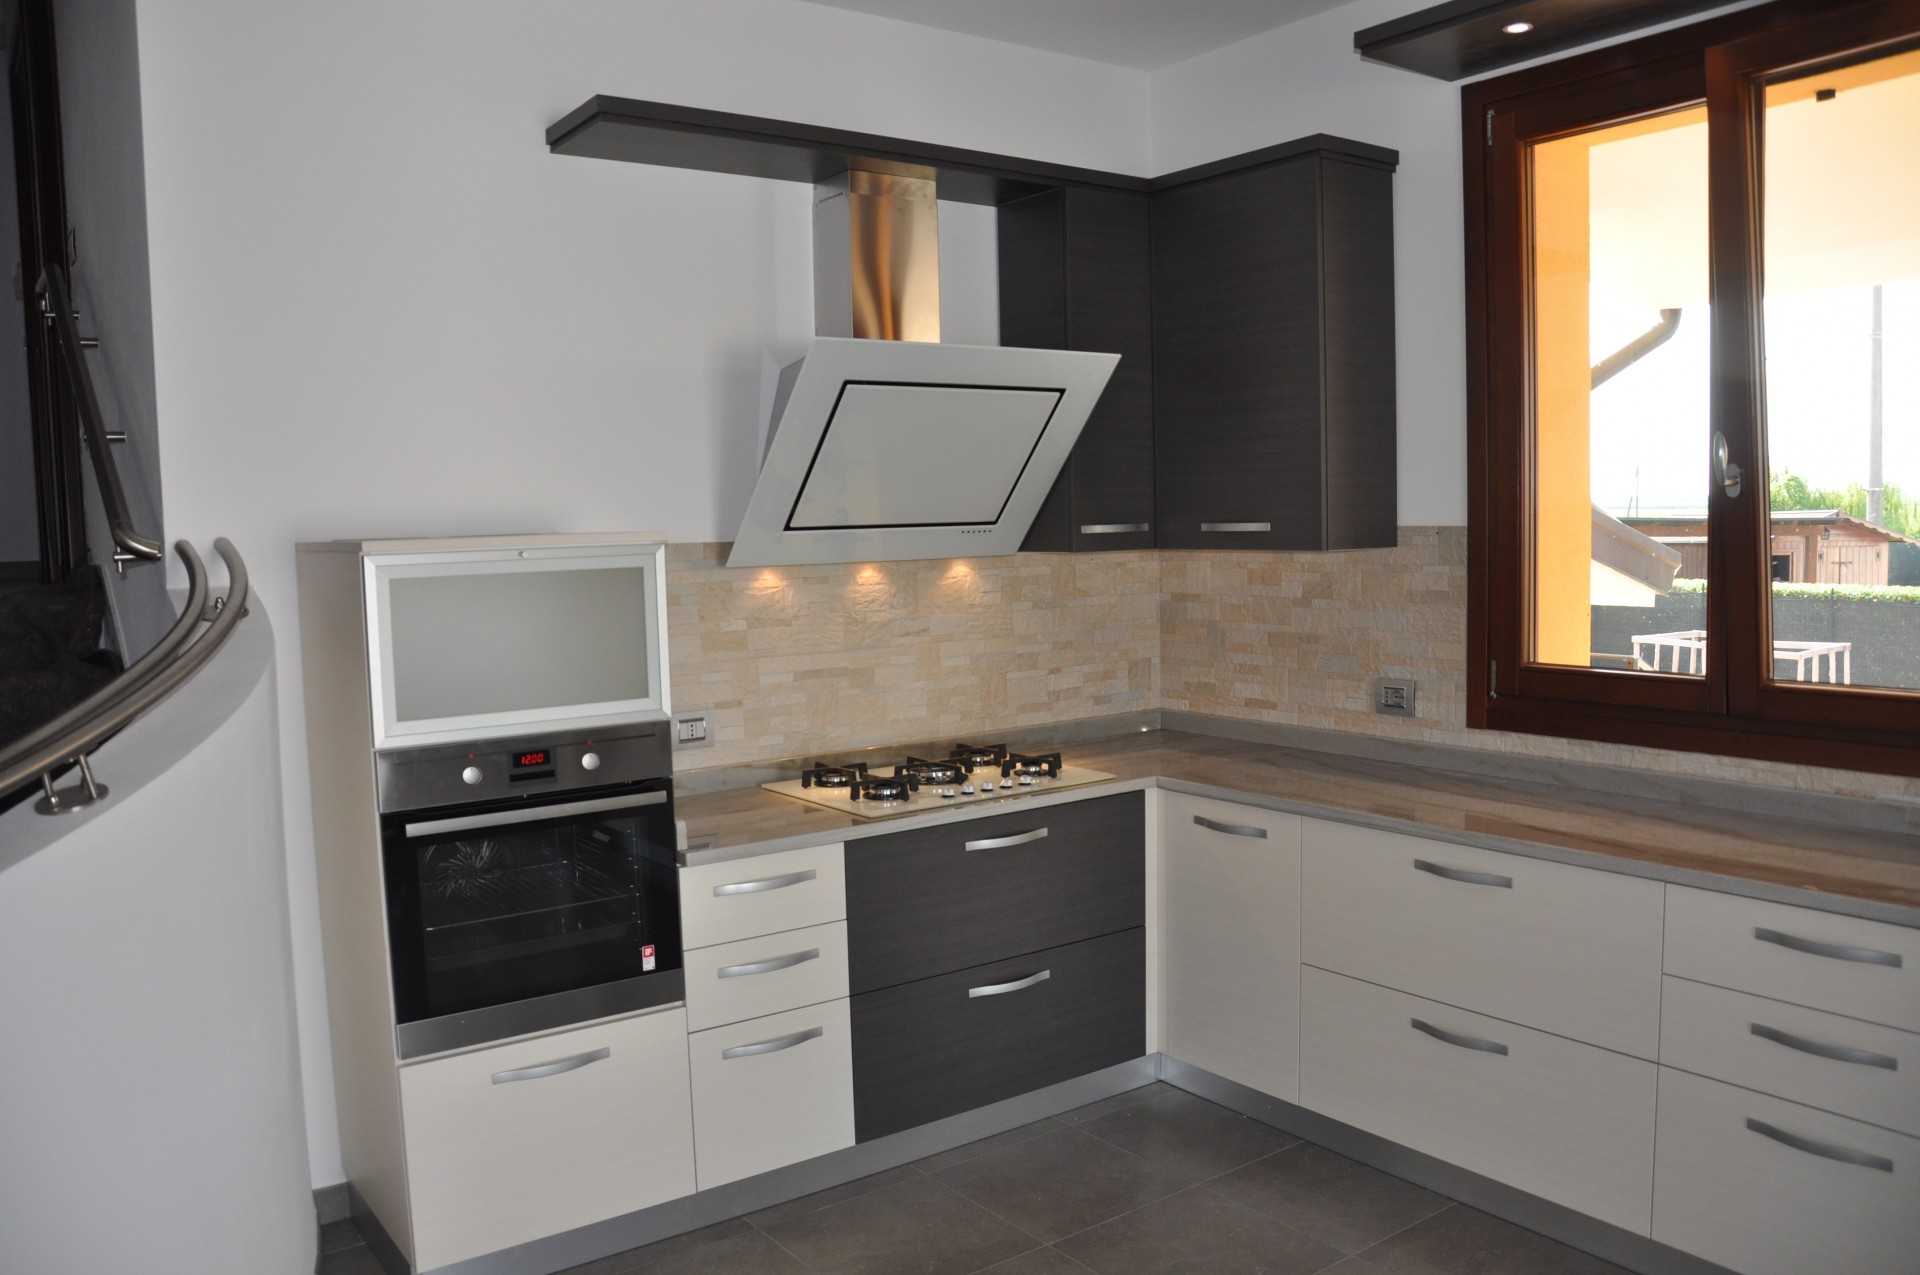 Cucine moderne fadini mobili cerea verona - Colori di cucine moderne ...